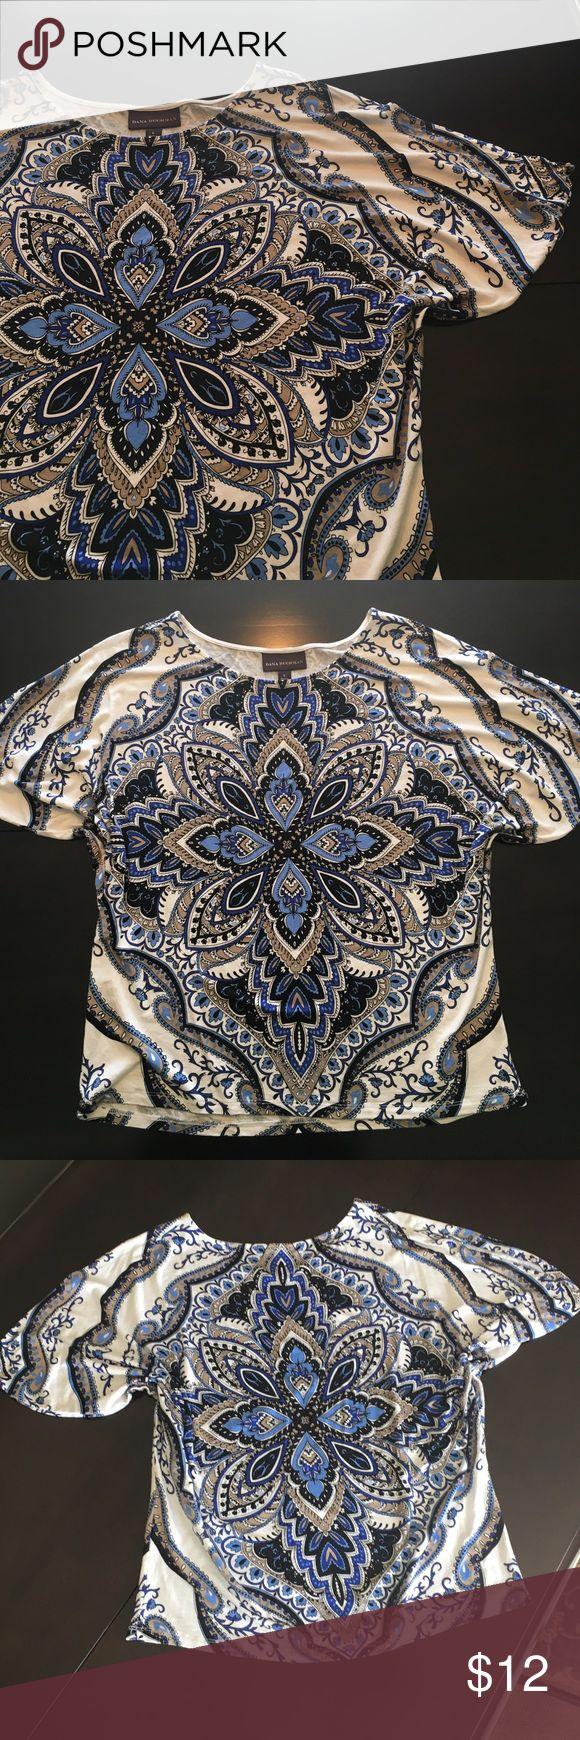 Dana Buchman batwing style patterned top. Dana Buchman batwing style top. Gorgeous blue, cream & white design.  Excellent condition. Dana Buchman Tops Blouses